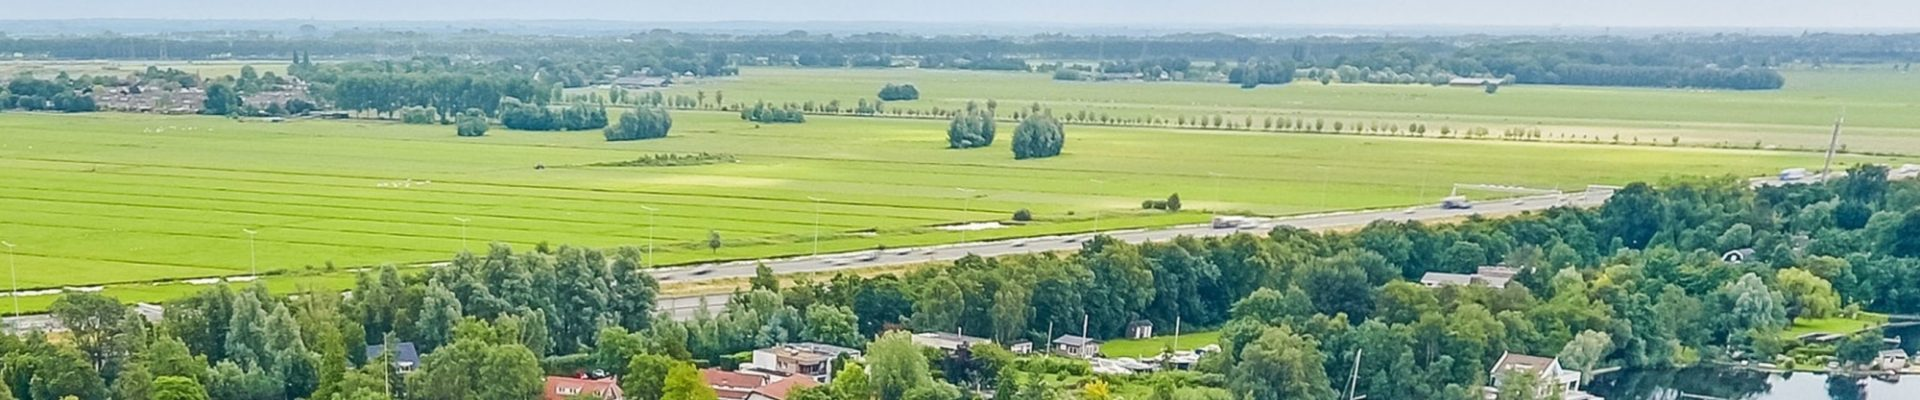 Kadaster Drone Fotografie 9